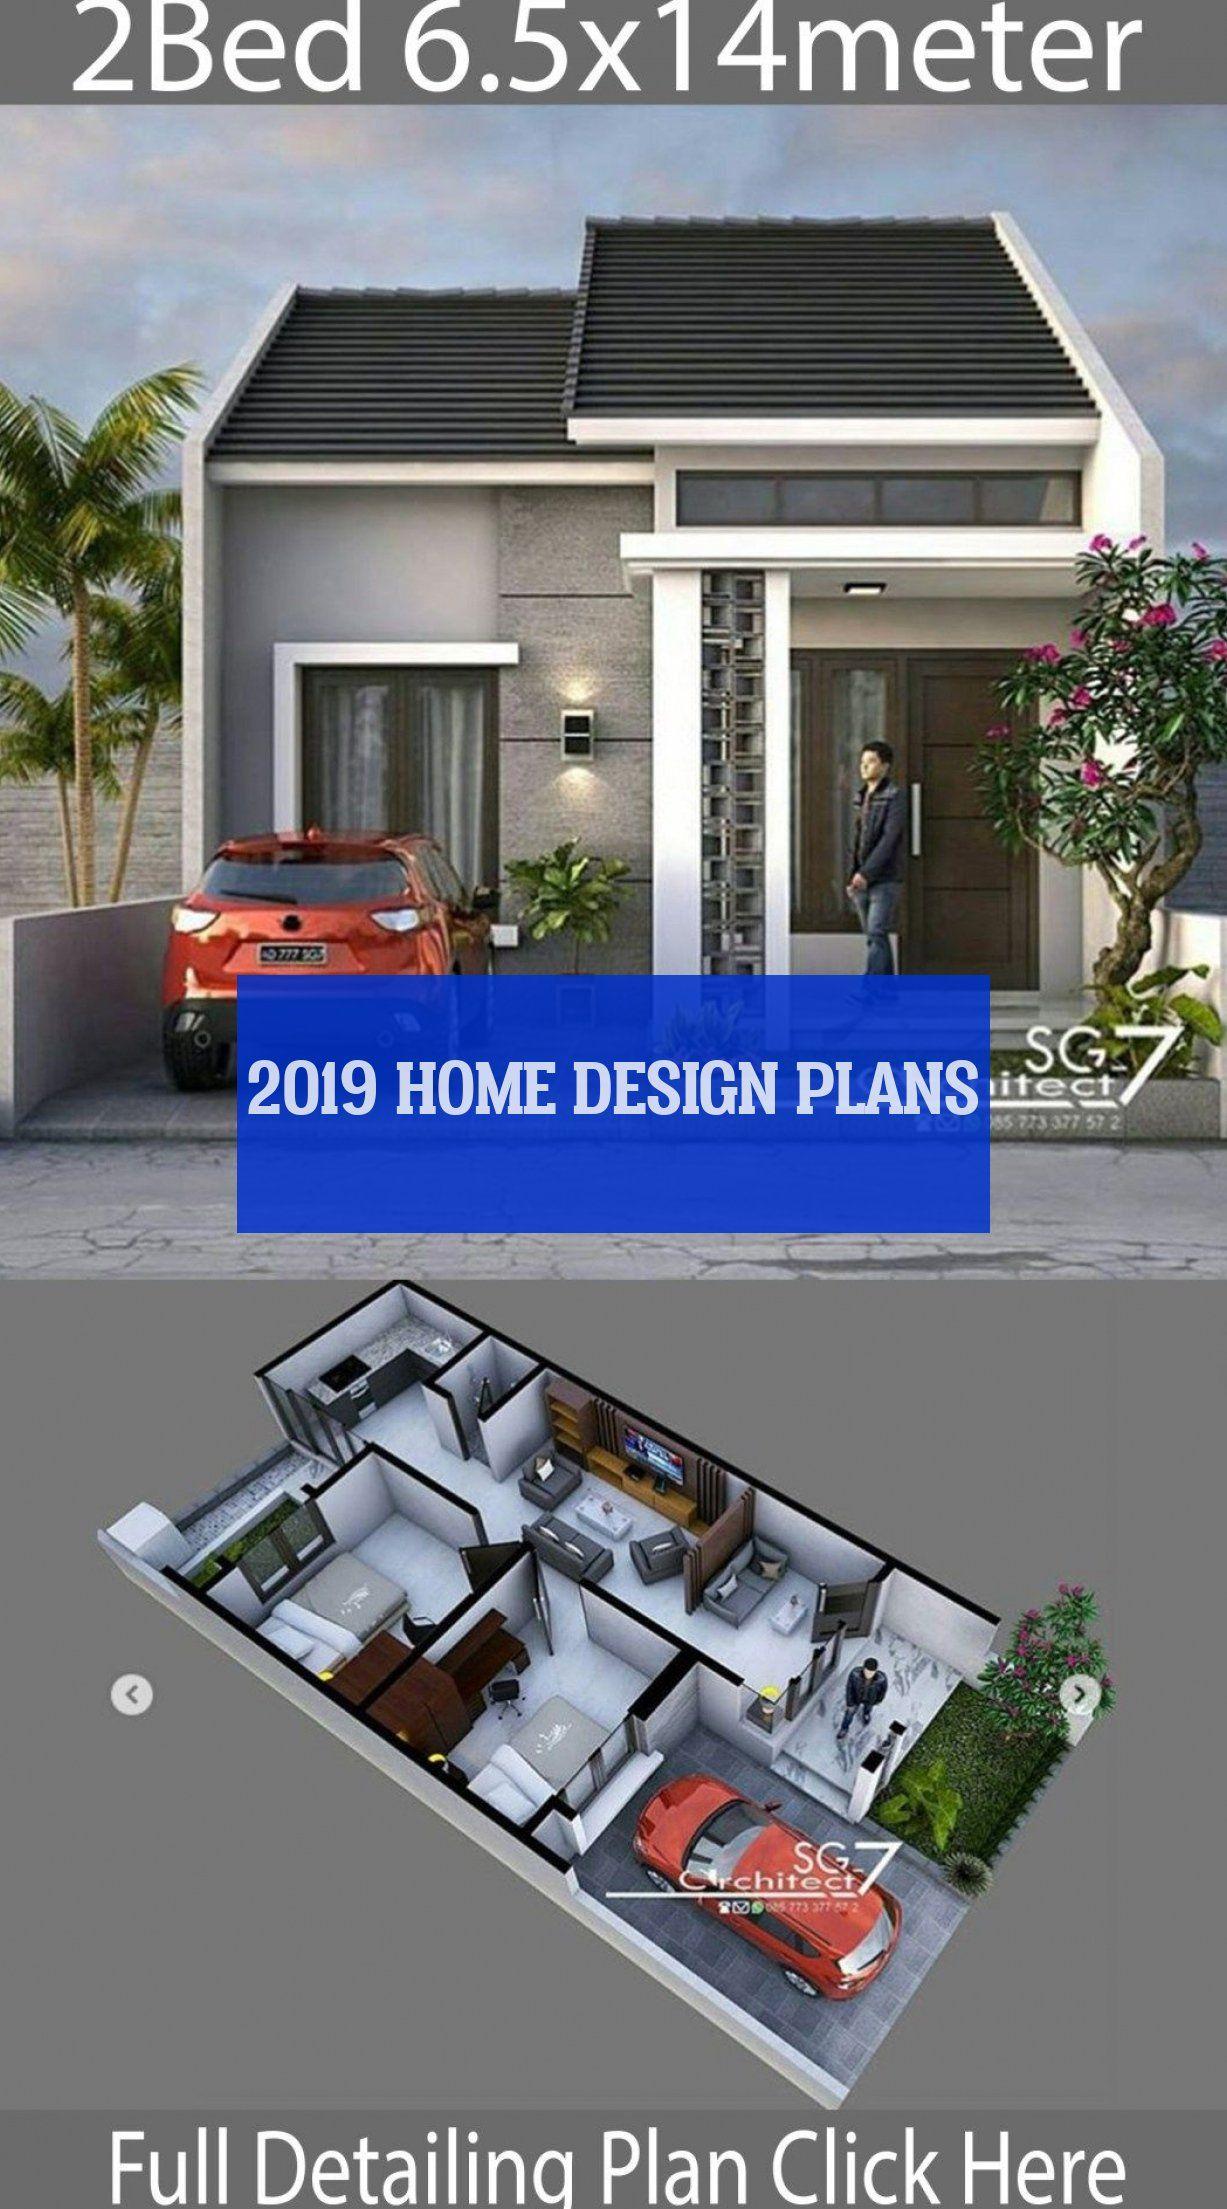 2019 Home Design Plans House Design Concrete White House Design House Design Wooden Newzealandhousedesign Hous Arsitektur Rumah Rumah Indah Rumah Minimalis